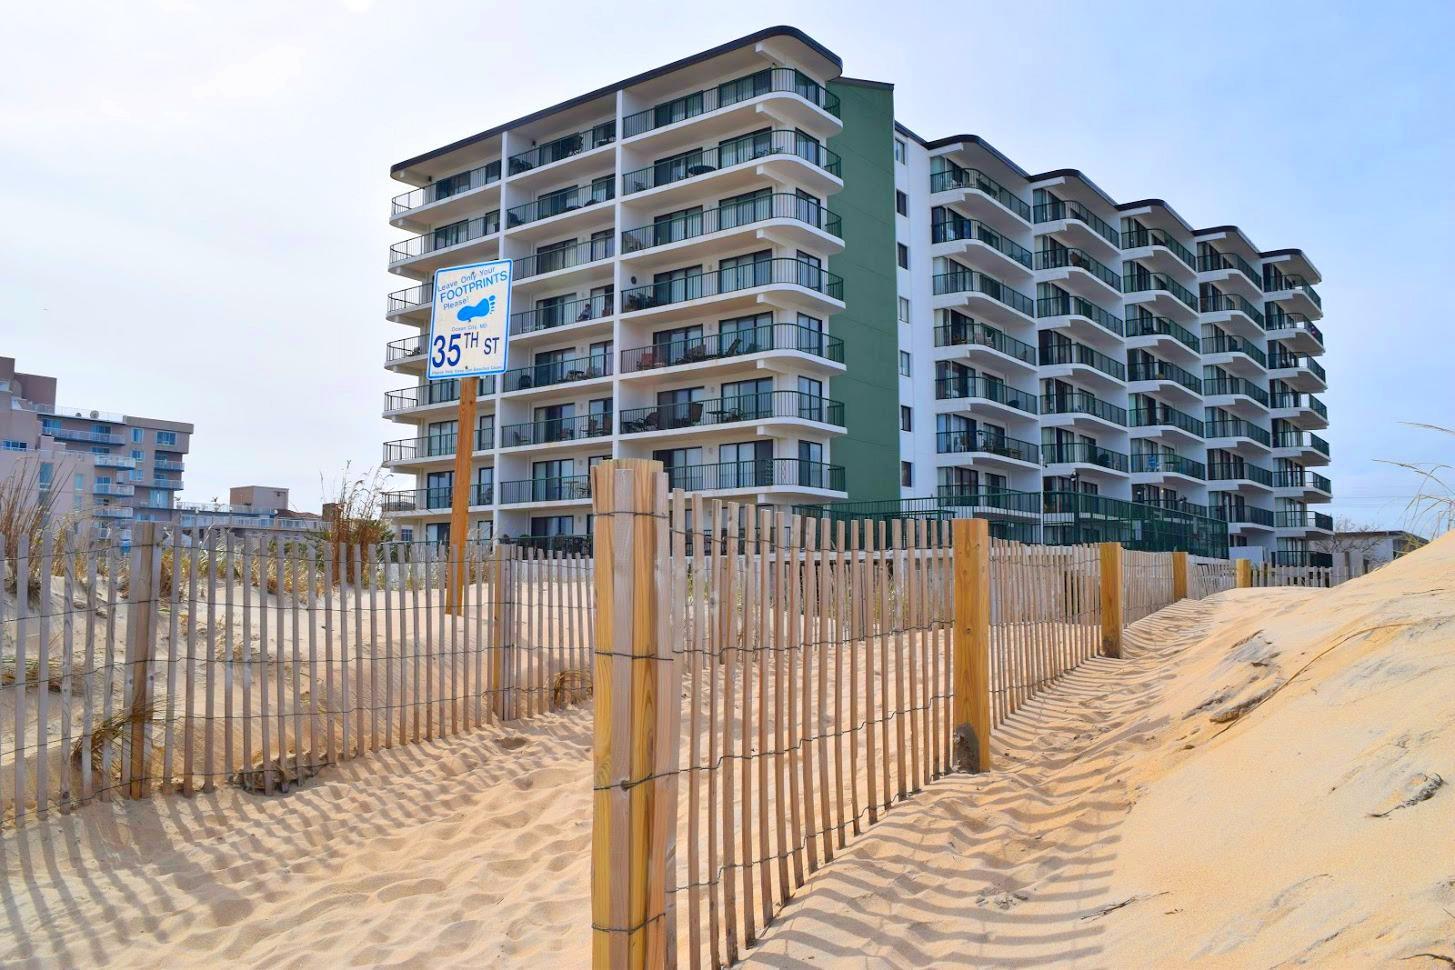 Summer Beach Dune Crossing